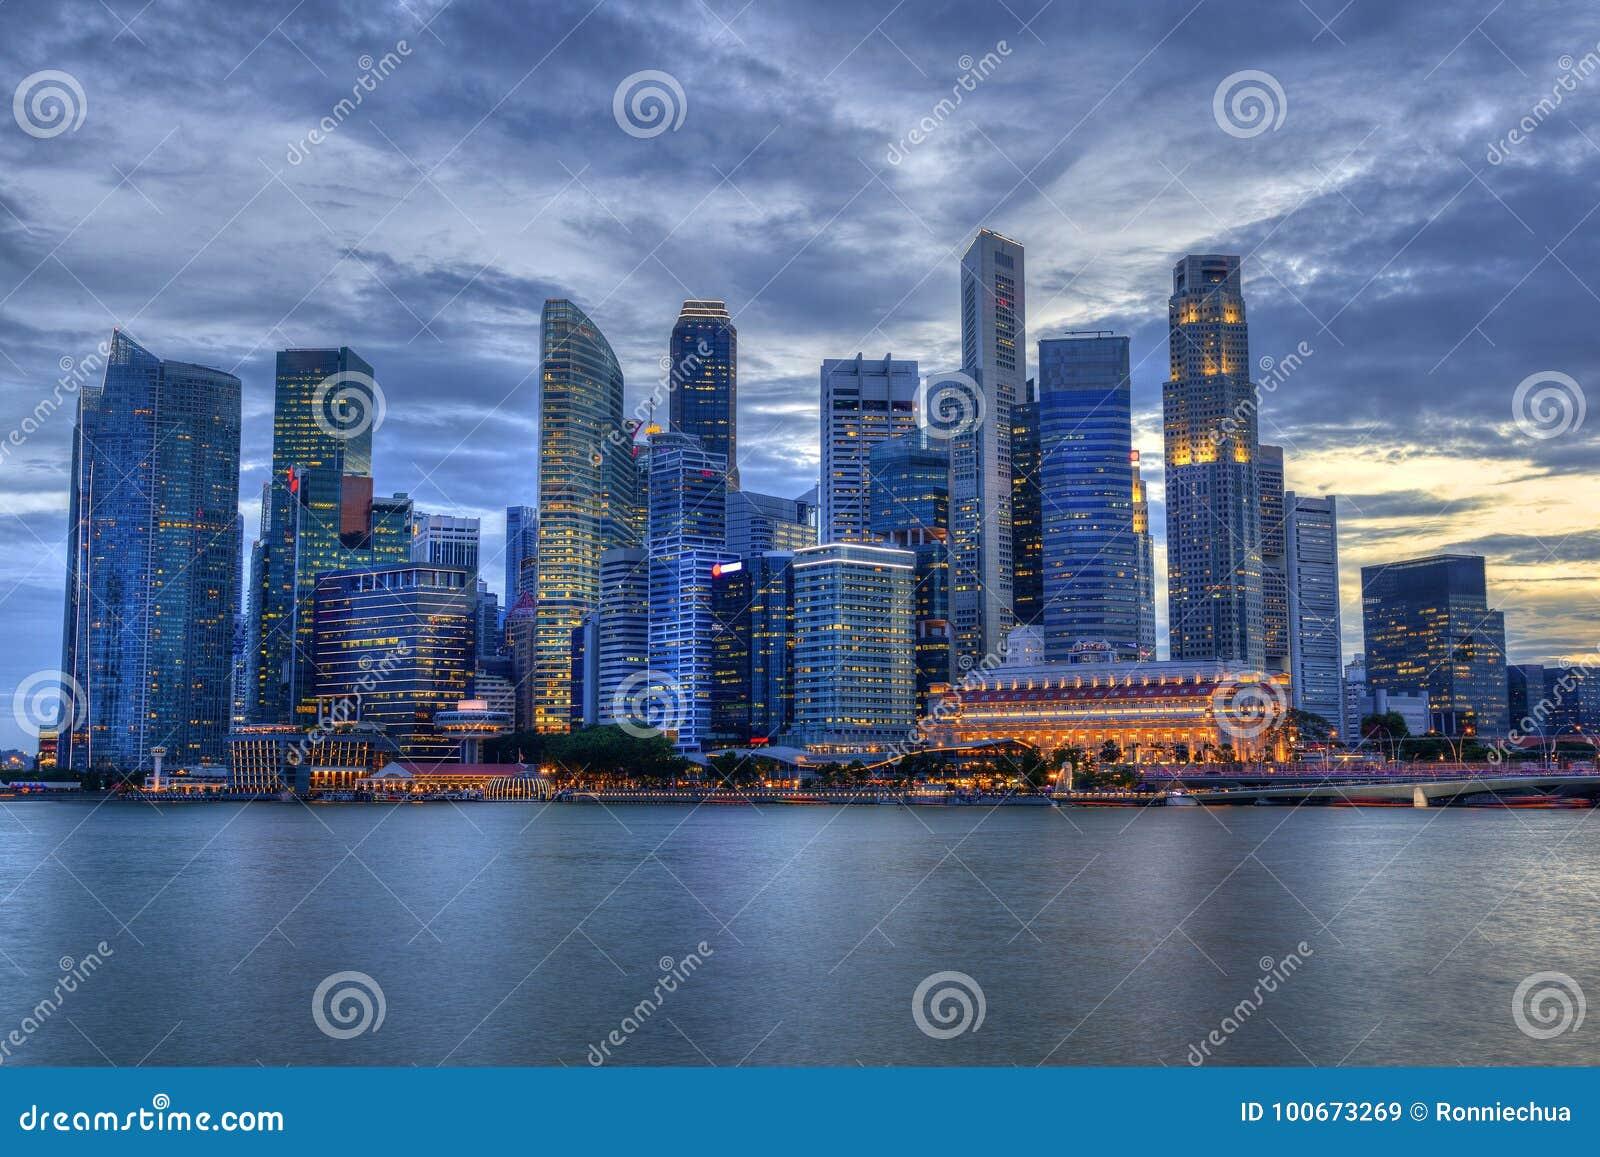 Singapore Skyline at Marina Bay During Sunset